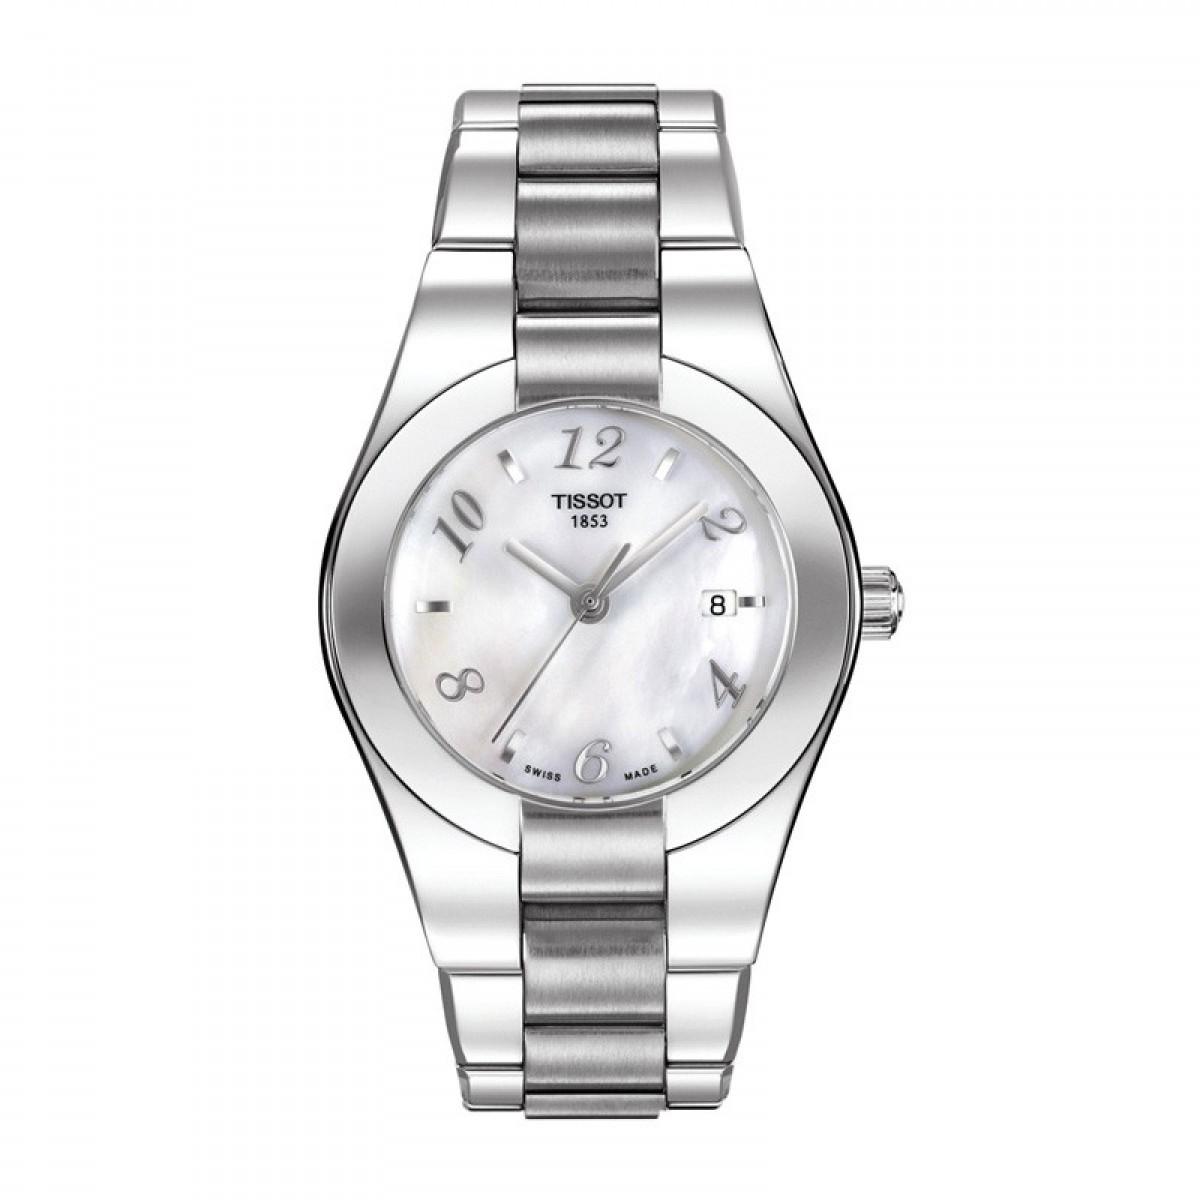 Часовник Tissot T043.210.11.117.00